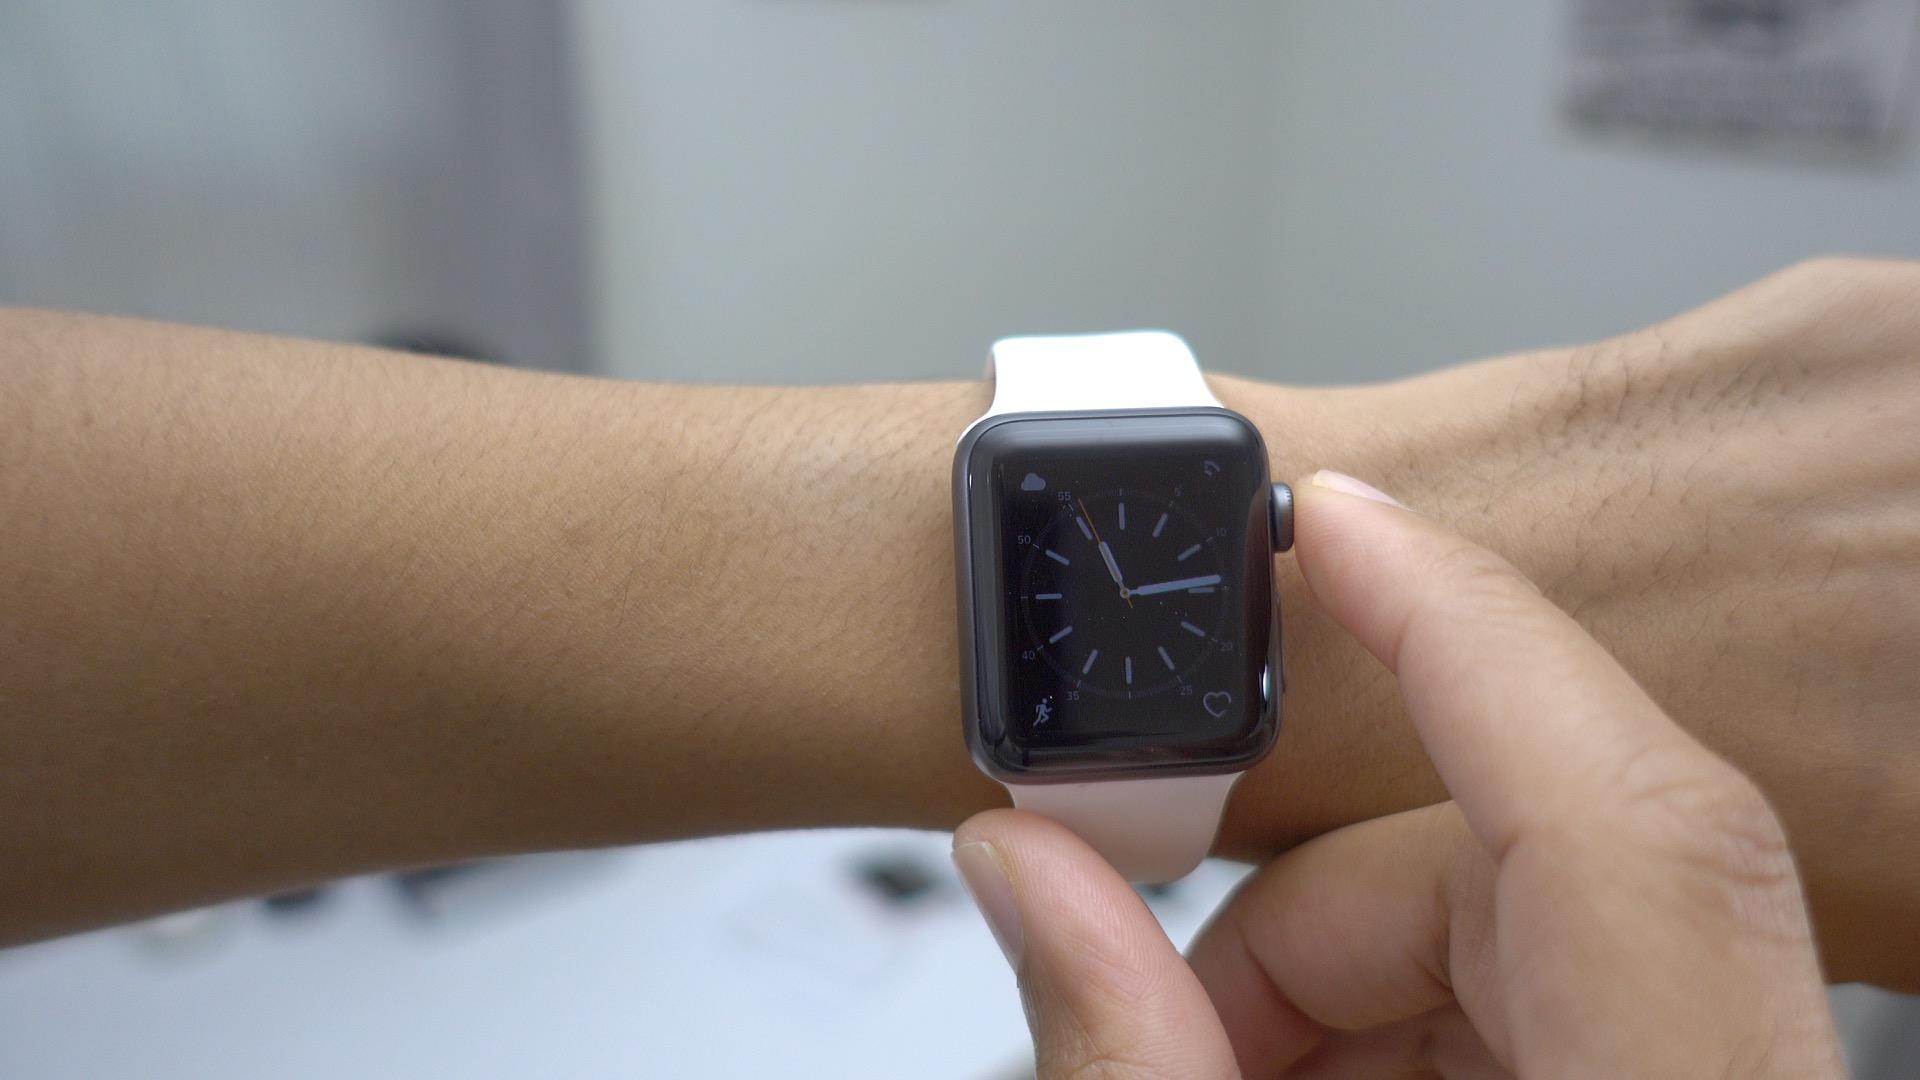 wake-screen-on-crown-up-watchos-3-apple-watch-series-1-and-apple-watch-series-2